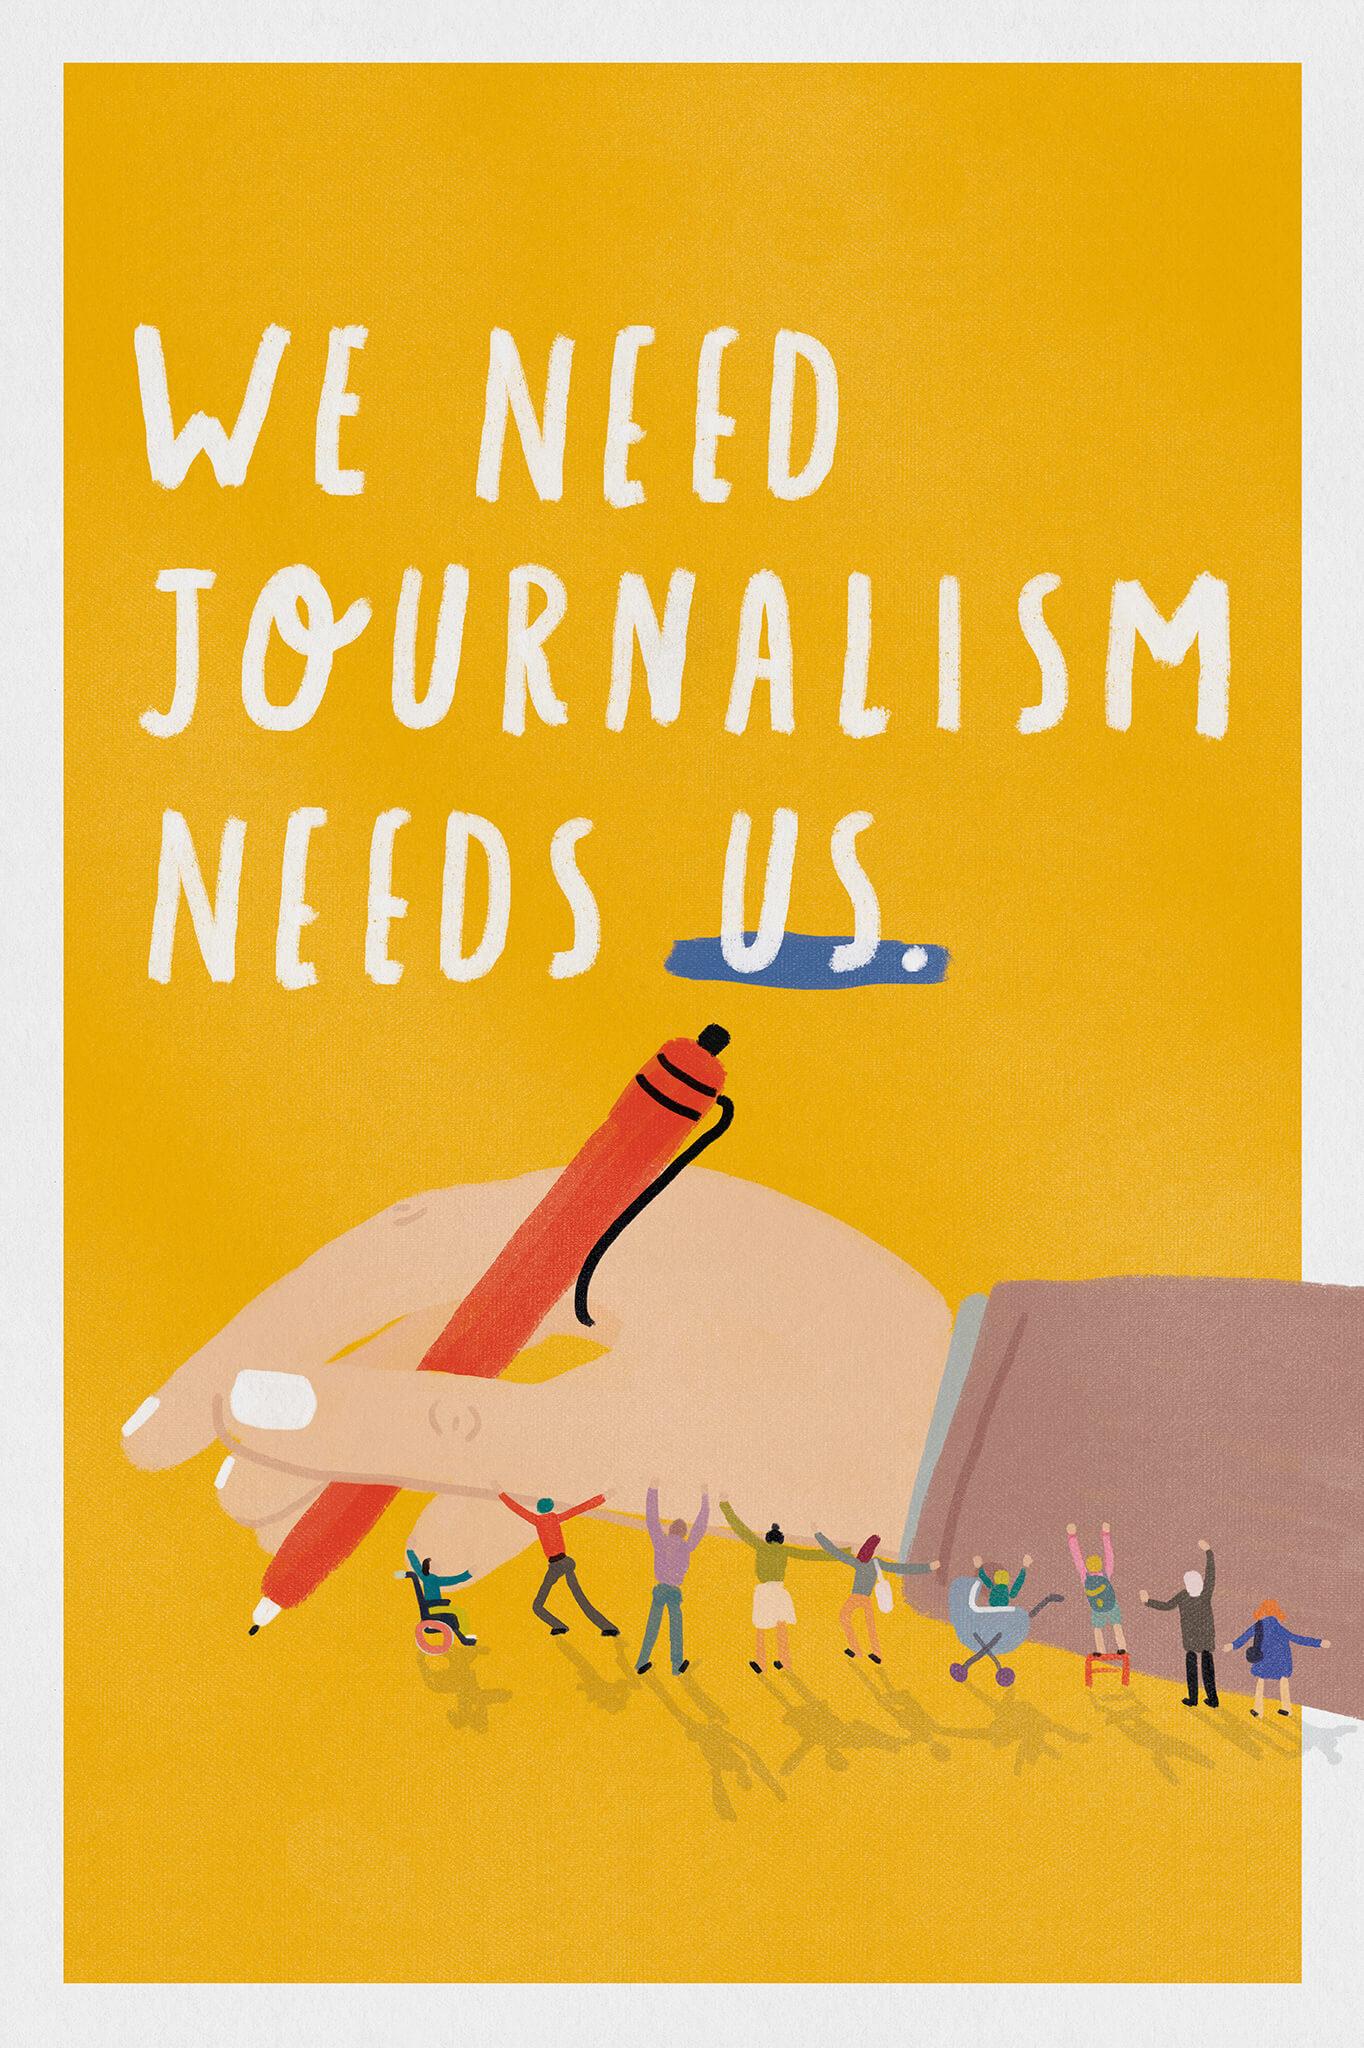 We Need Journalism (series, 1/3) main image